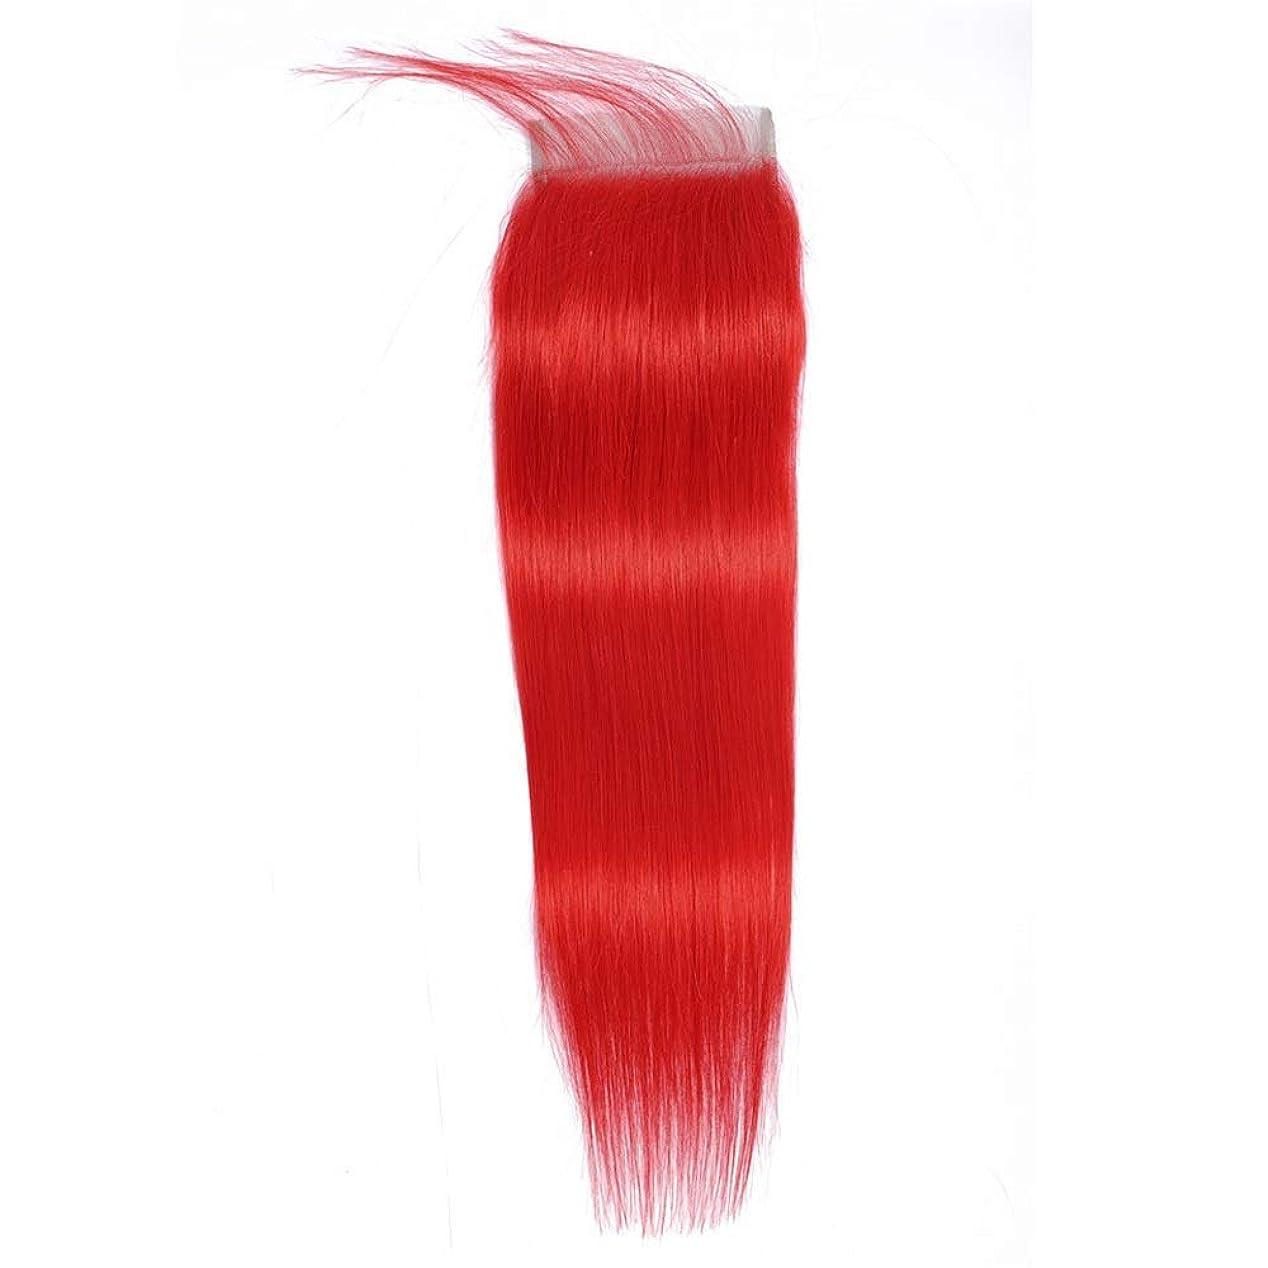 HOHYLLYA 4×4インチ赤ストレートヘアーレースの閉鎖ブラジルのバージン人間の髪の毛の閉鎖10インチ-16インチファッションかつら (色 : レッド, サイズ : 12 inch)